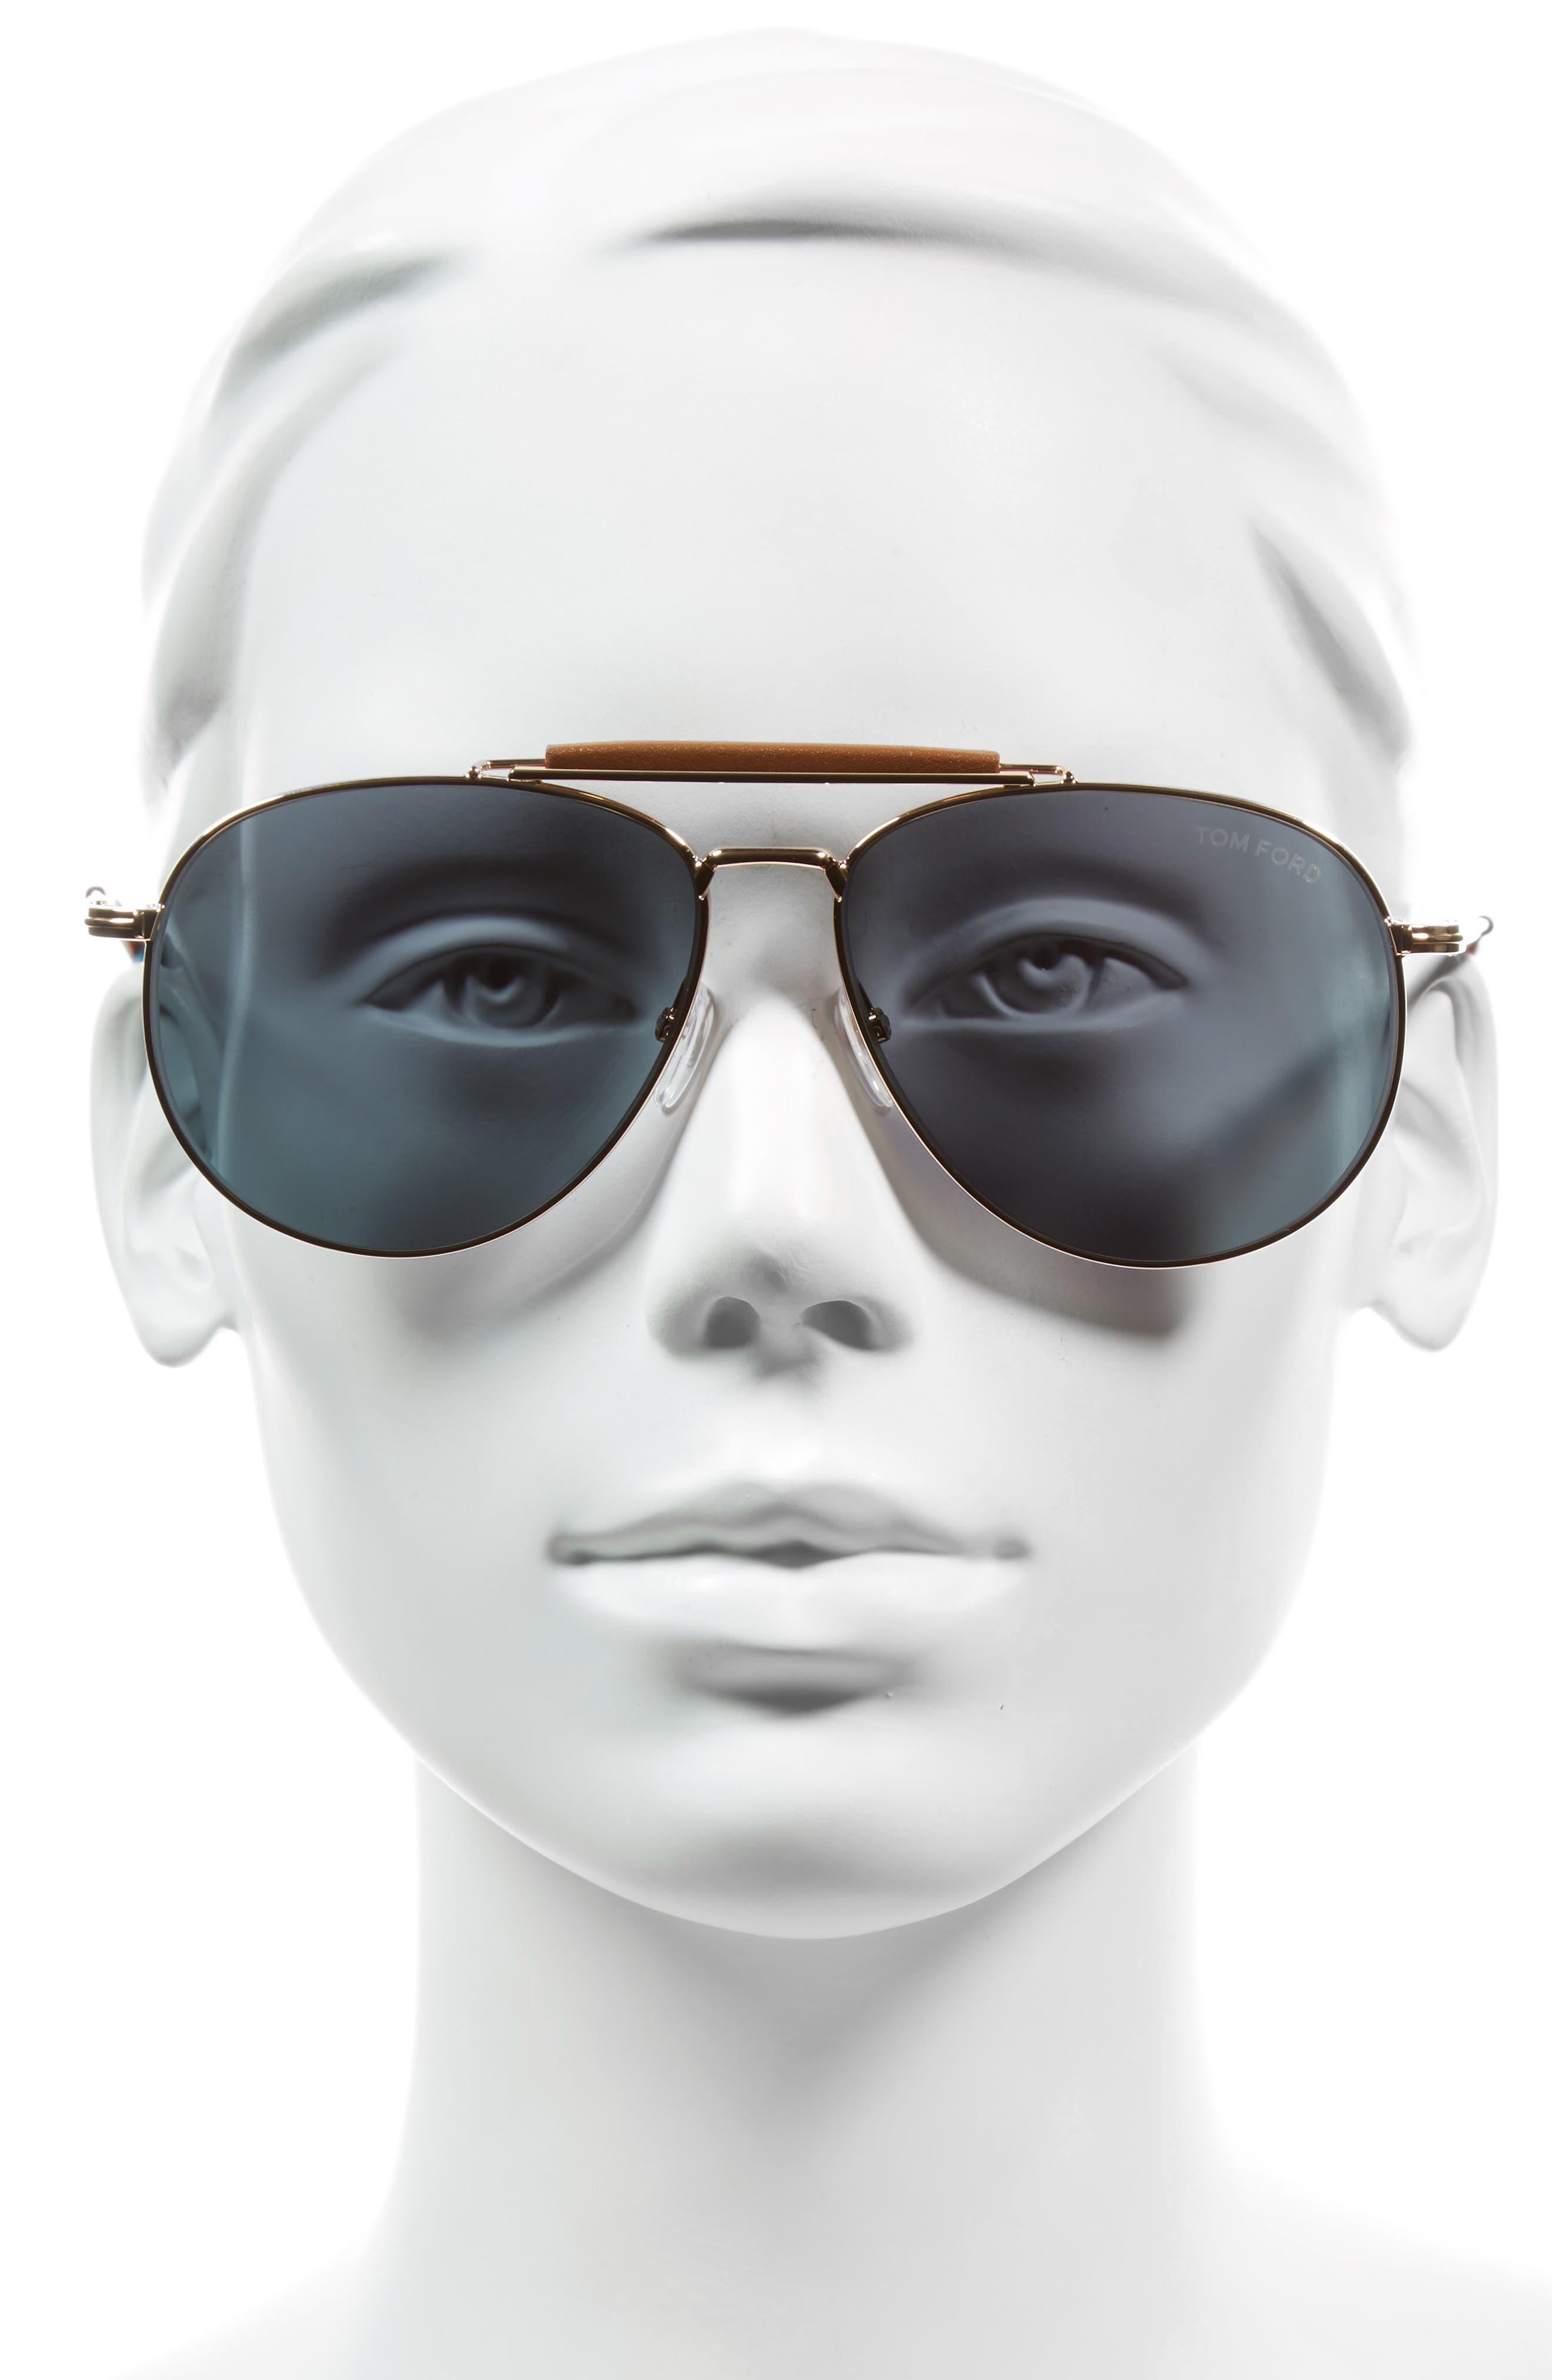 Sean 60mm Aviator Sunglasses,                             Alternate thumbnail 2, color,                             ROSE GOLD/ BROWN/ PINK MIRROR